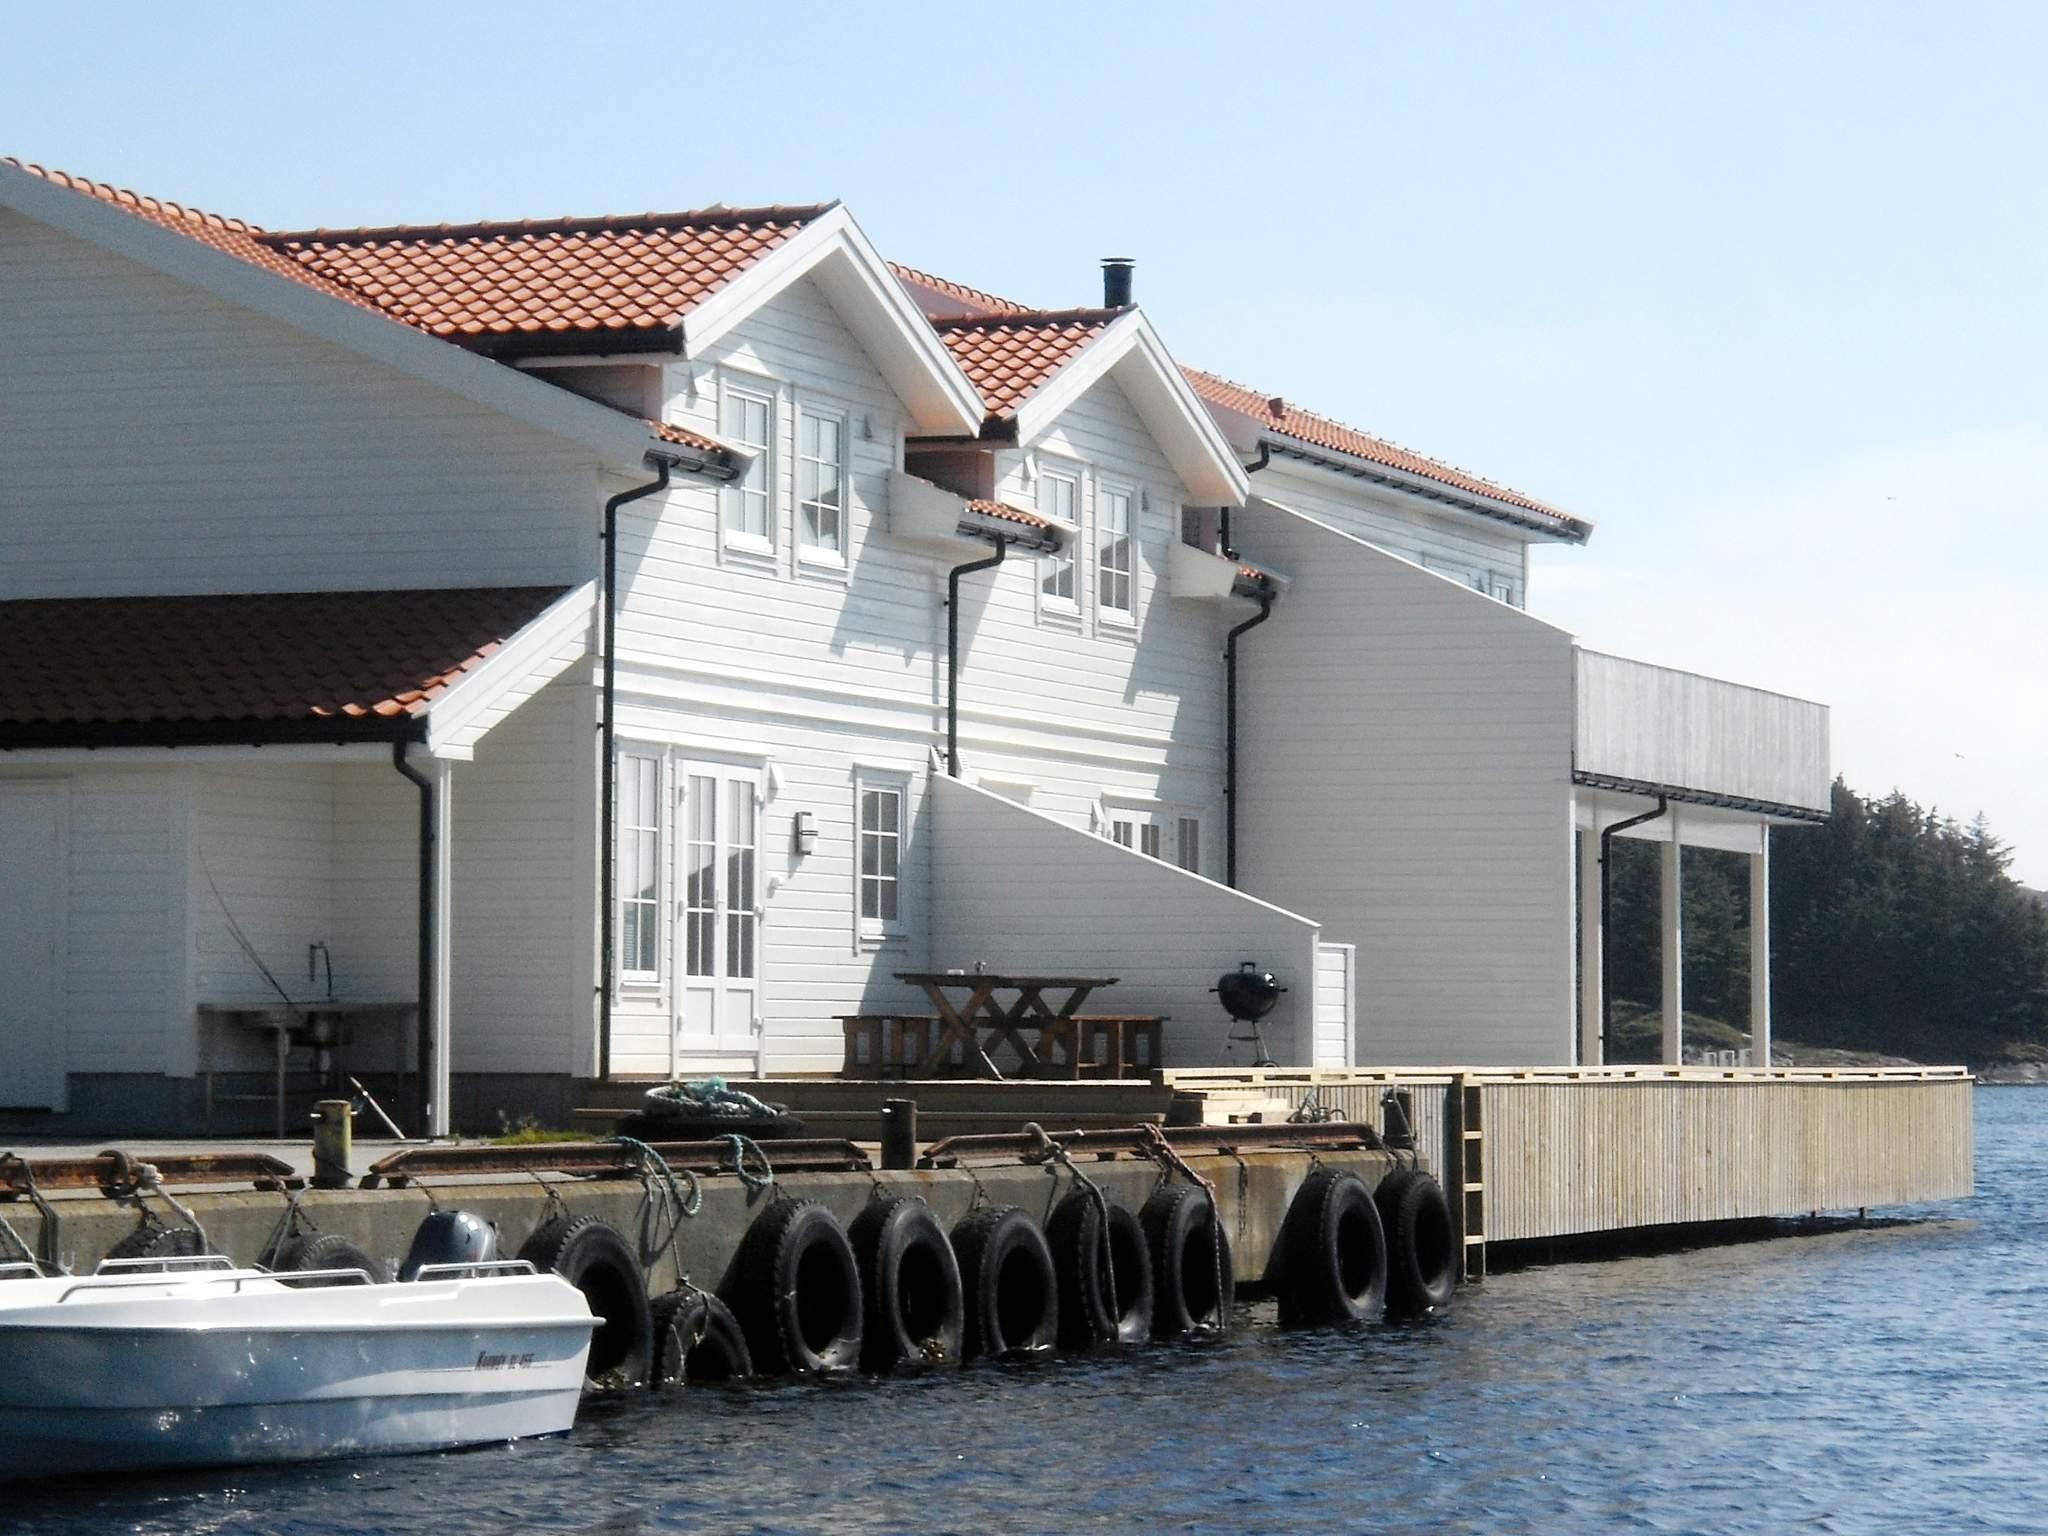 Ferienhaus Mølstrevåg (365130), Sveio, Hordaland - Hardangerfjord, Westnorwegen, Norwegen, Bild 13